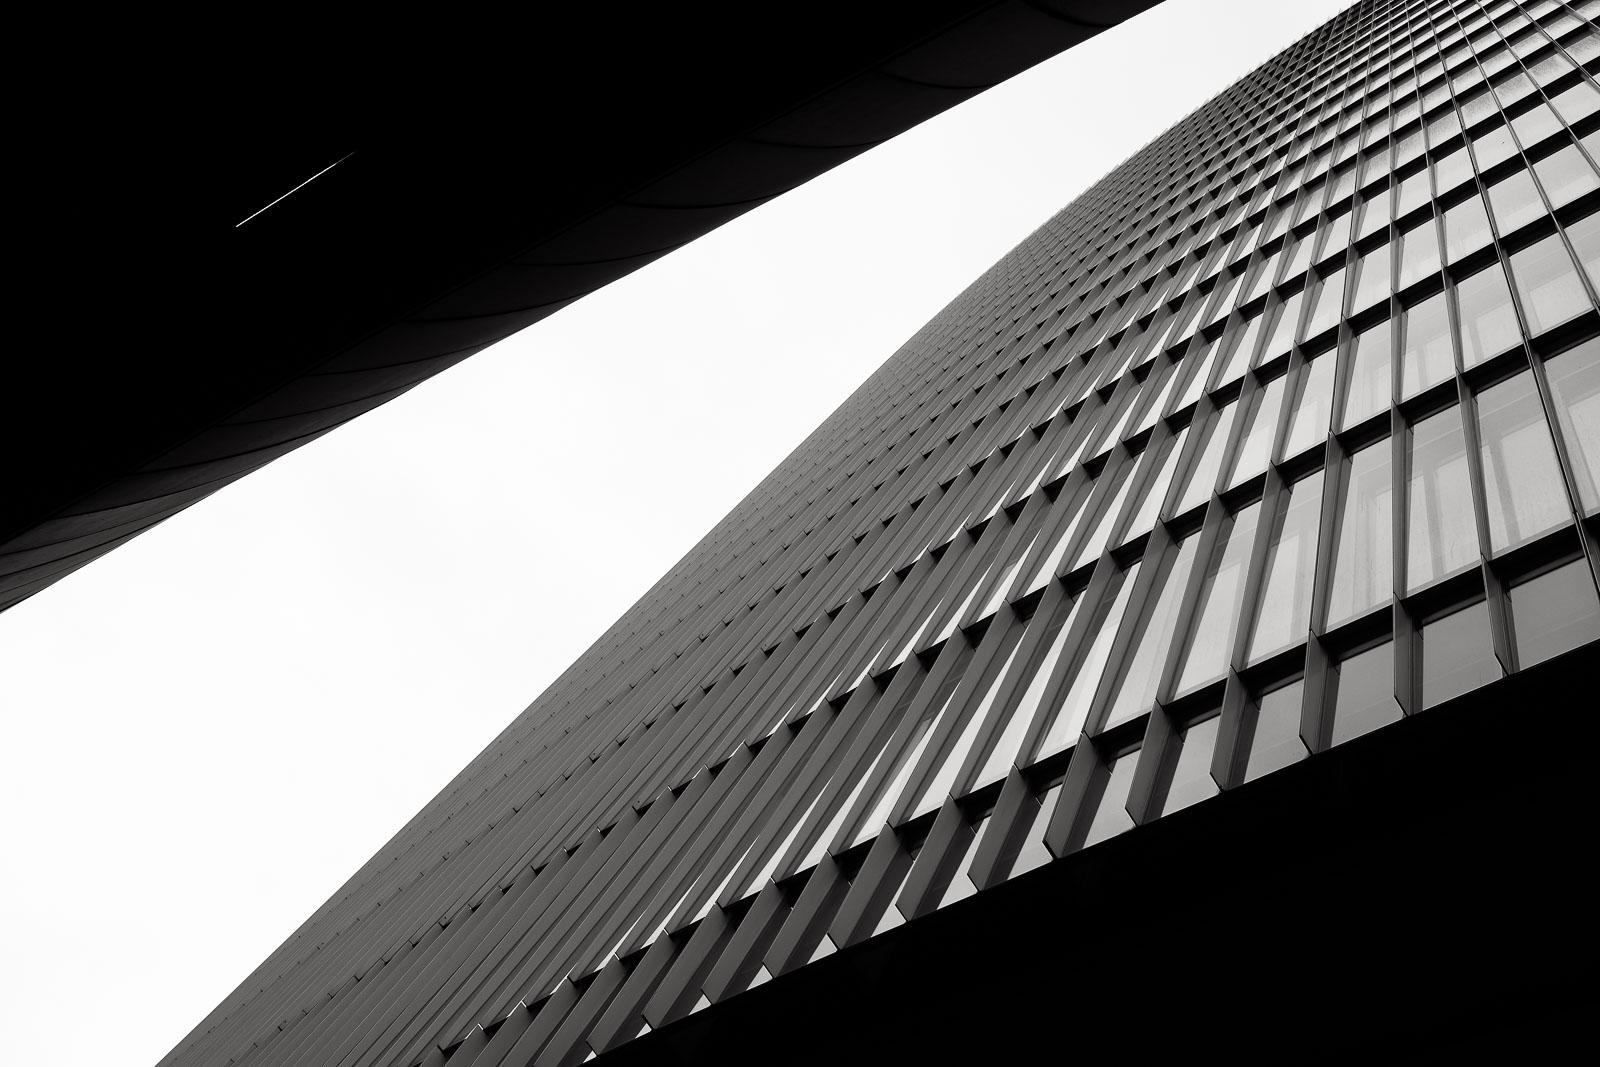 london_sonntag-65.jpg